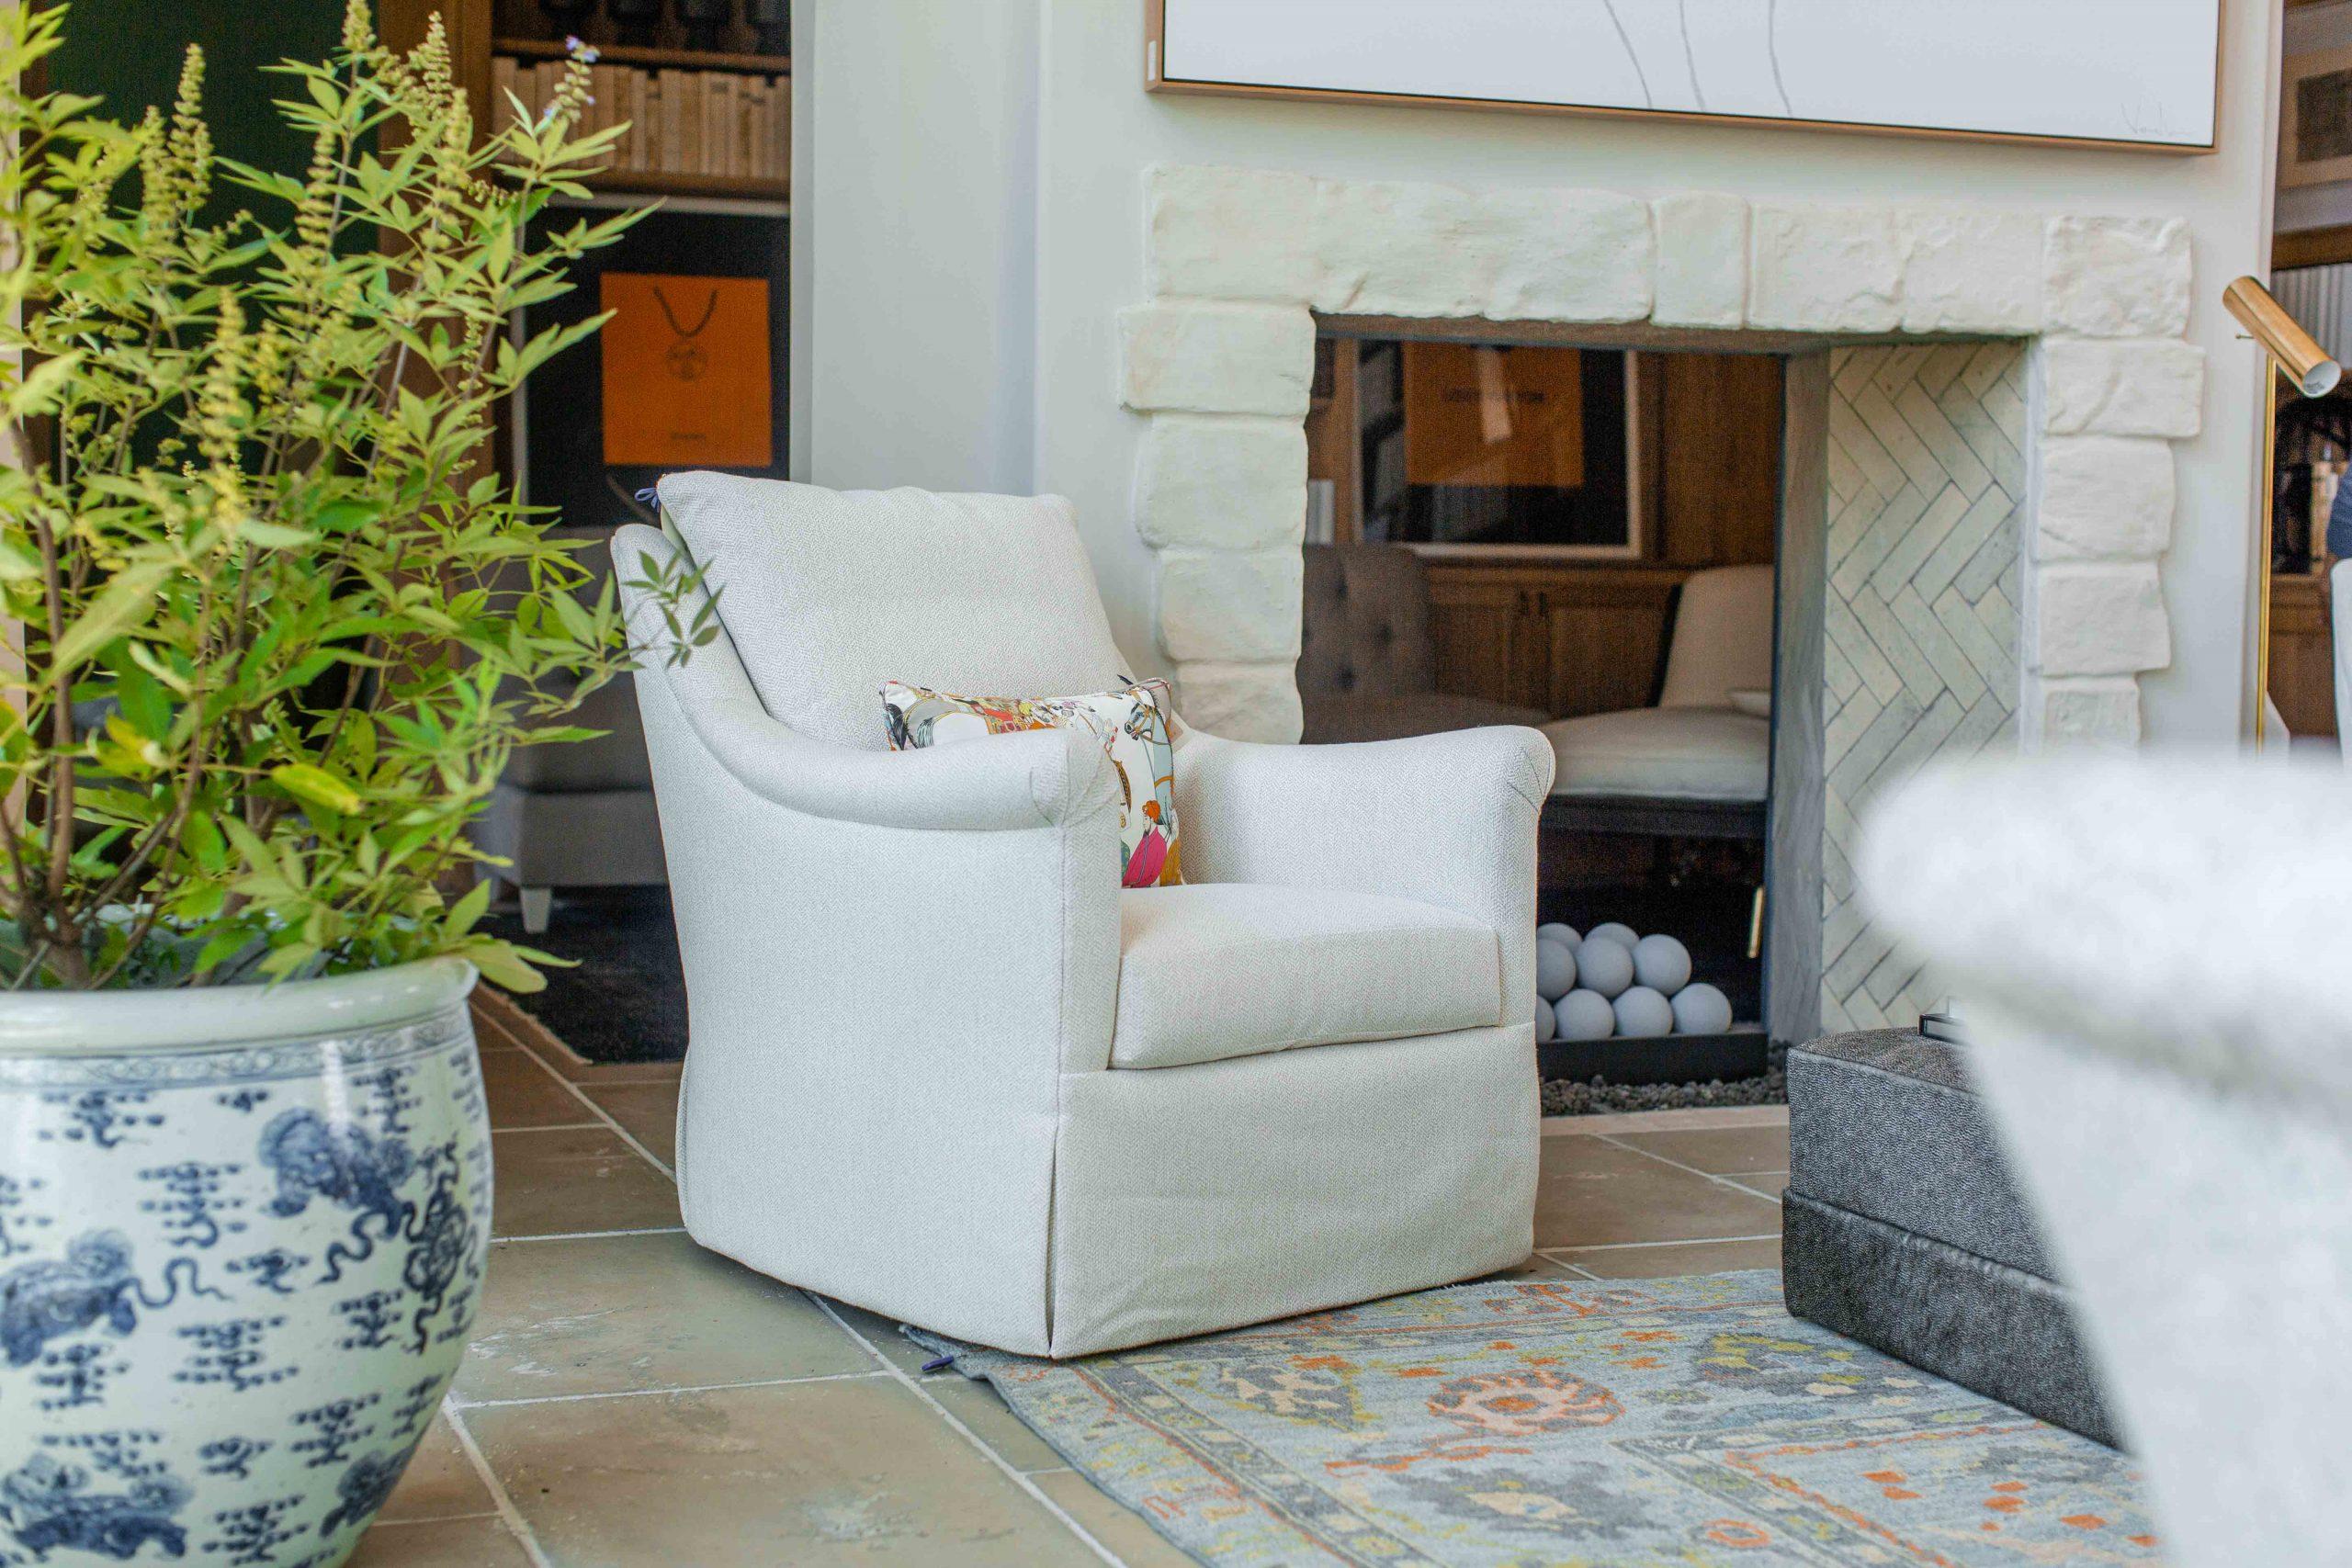 dixon-smith-interiors-baton-rouge-interior-design-custom-ivy-house-show-home-Web-0013